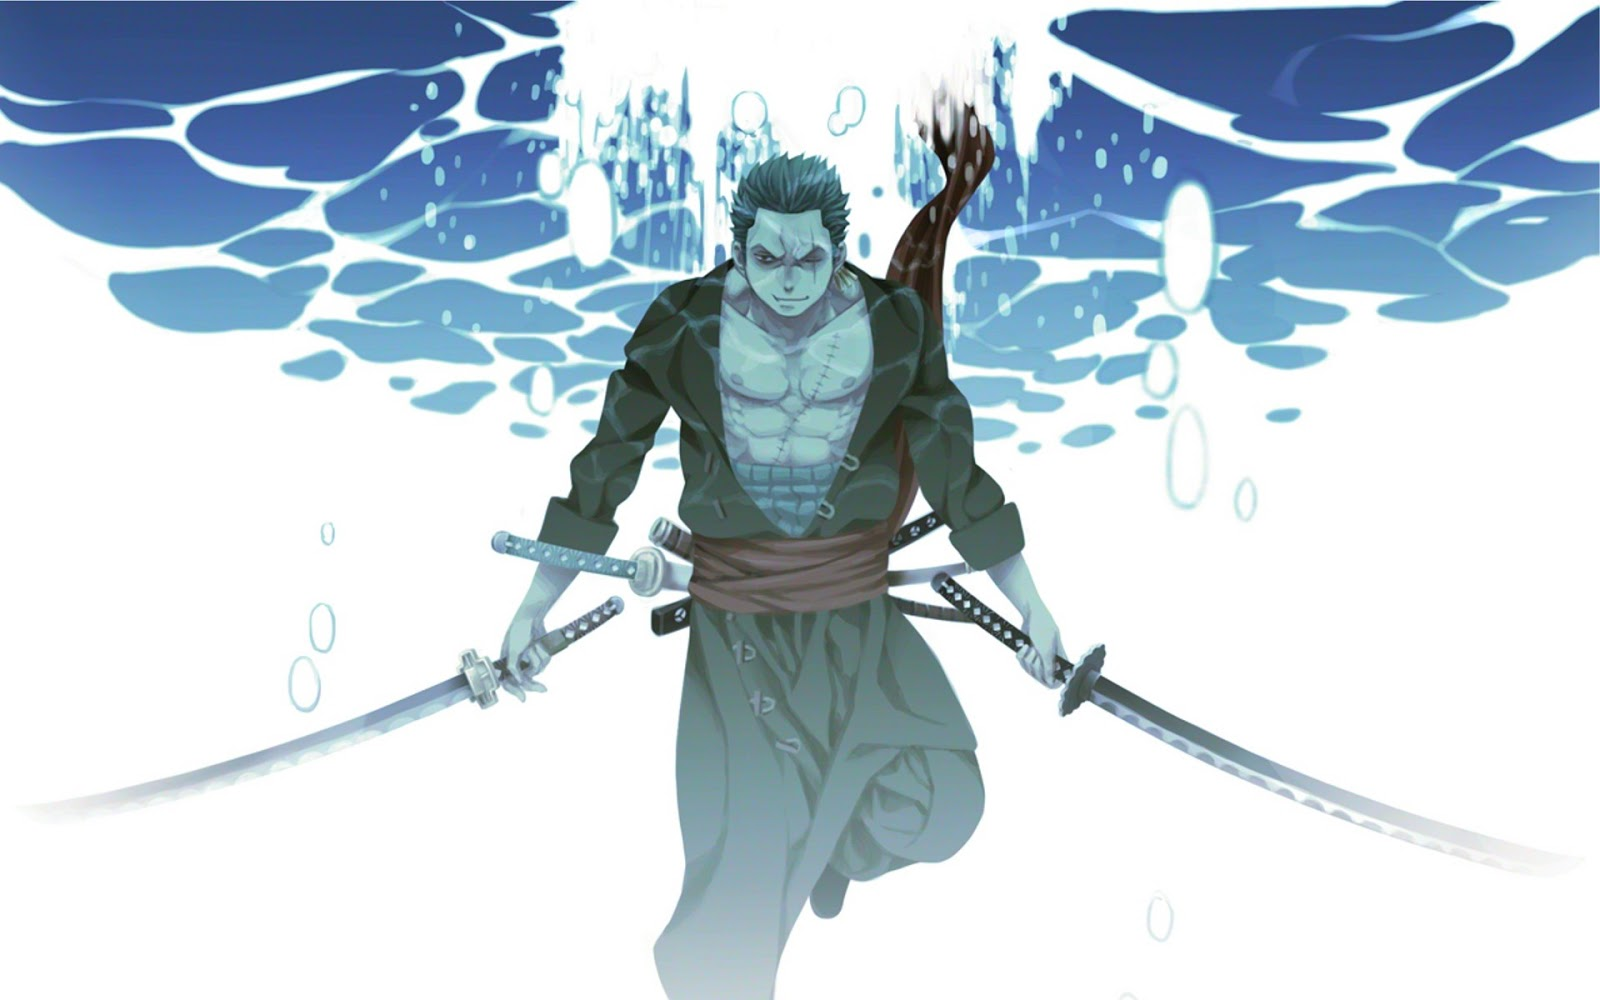 Sword Underwater One Piece Anime HD Wallpaper Desktop Background 1600x1000